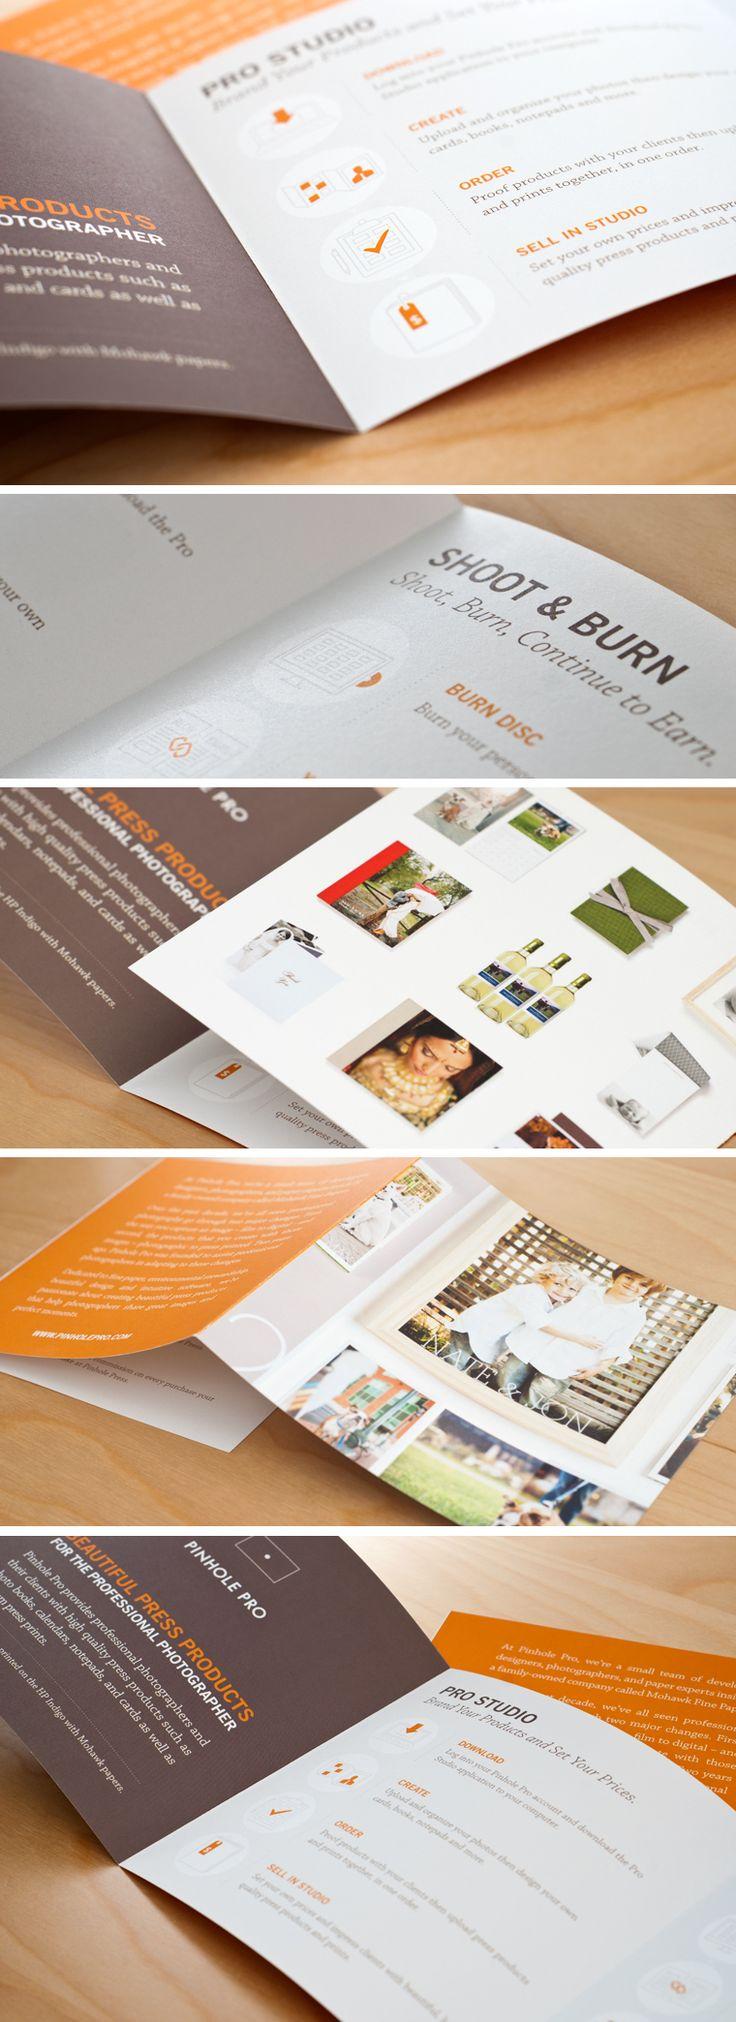 Brochure detail shots with a nice brown/orange color scheme